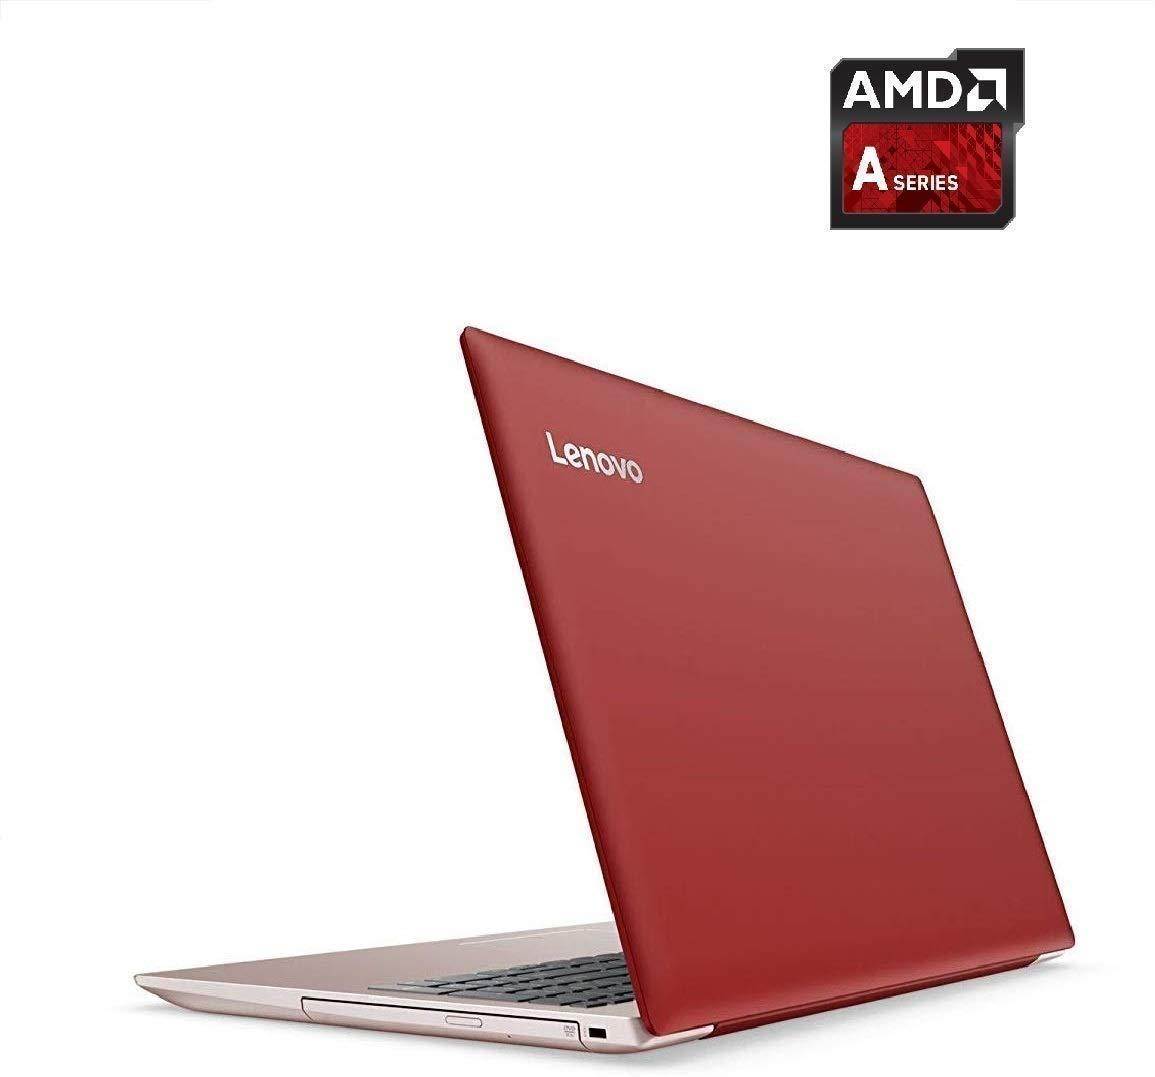 Lenovo Ideapad 330 Premium Business